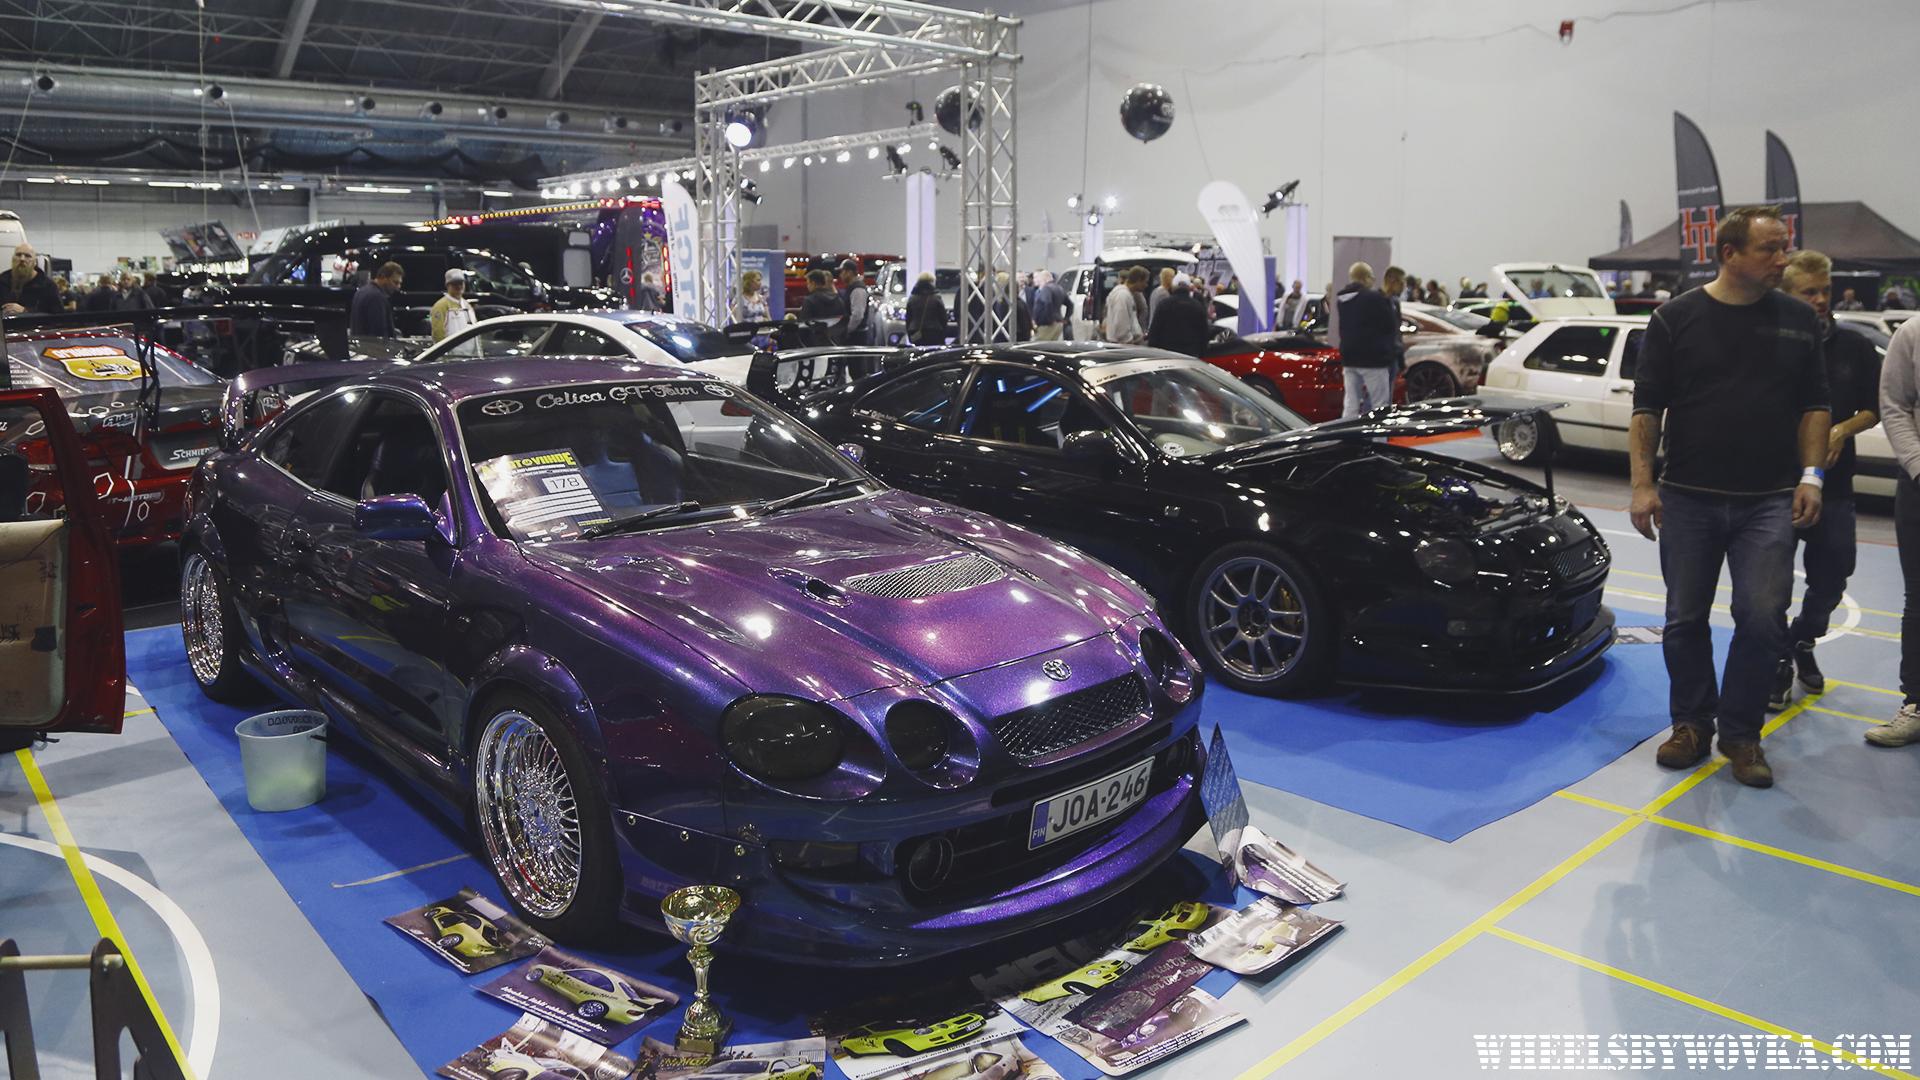 x-treme-car-show-lahti-2017-5